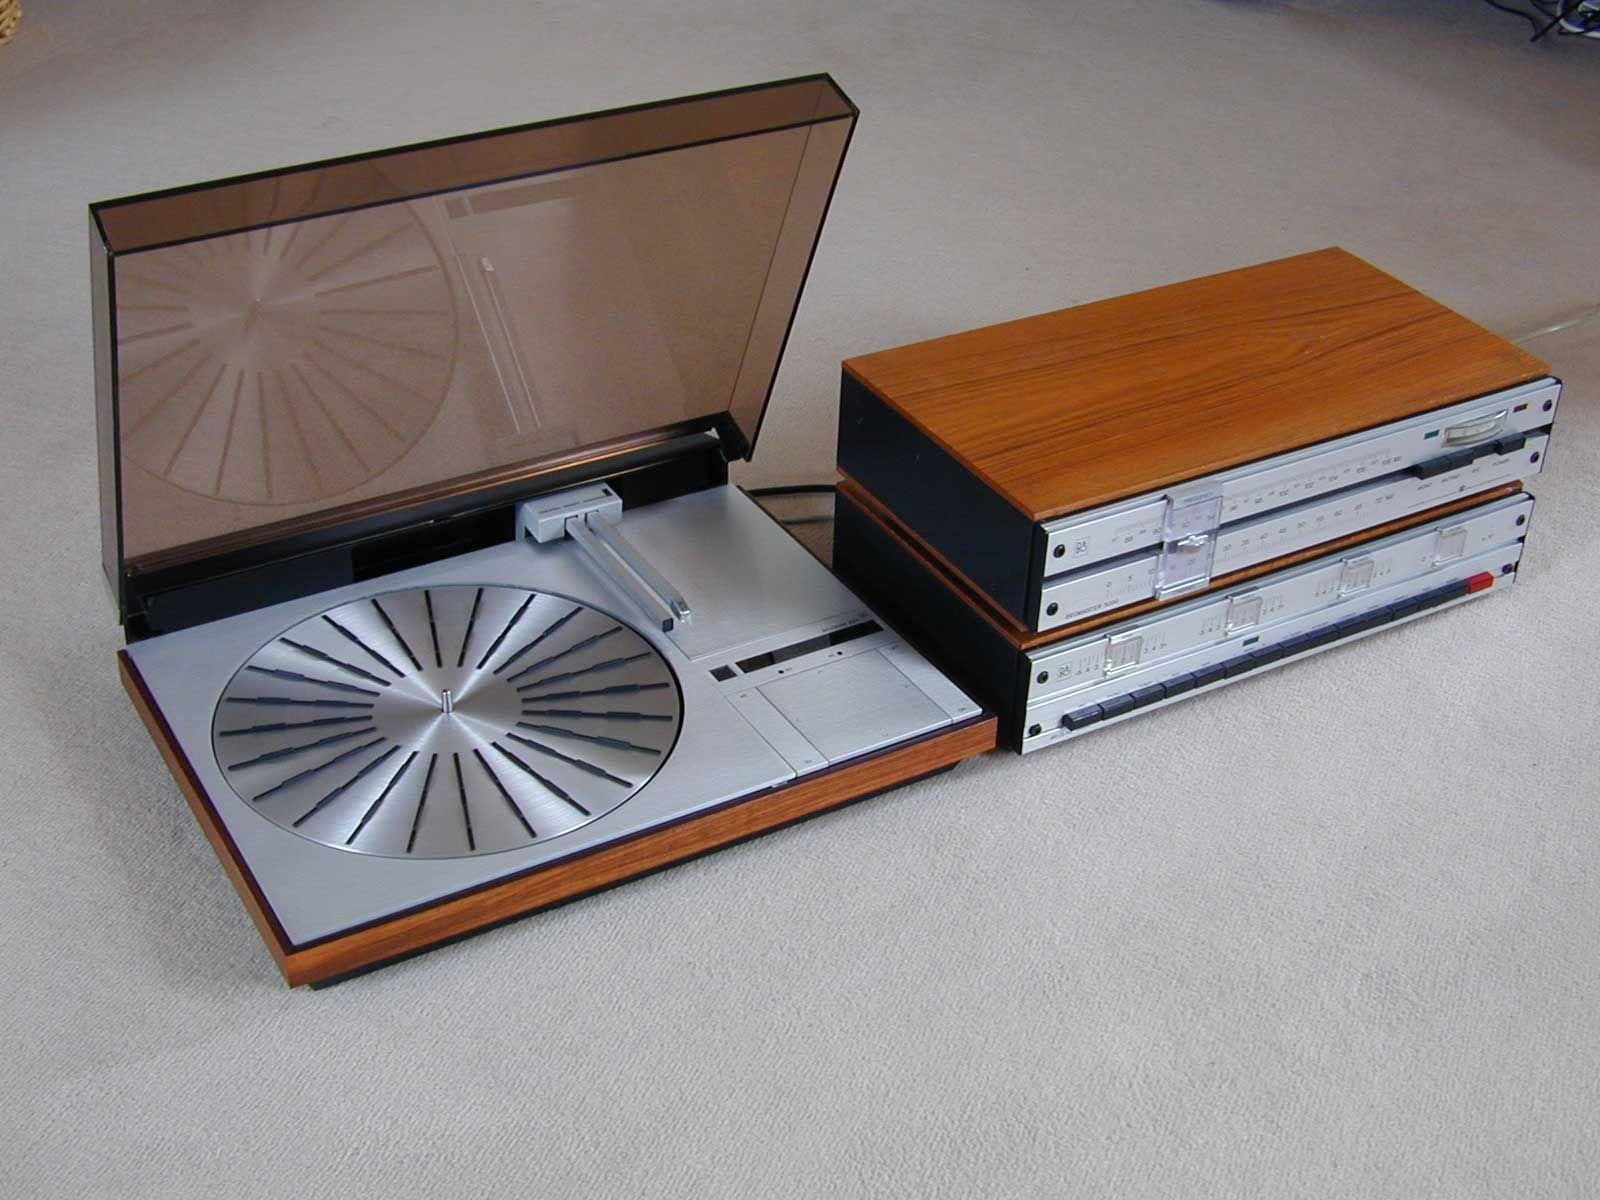 bang olufsen beep beep pinterest. Black Bedroom Furniture Sets. Home Design Ideas